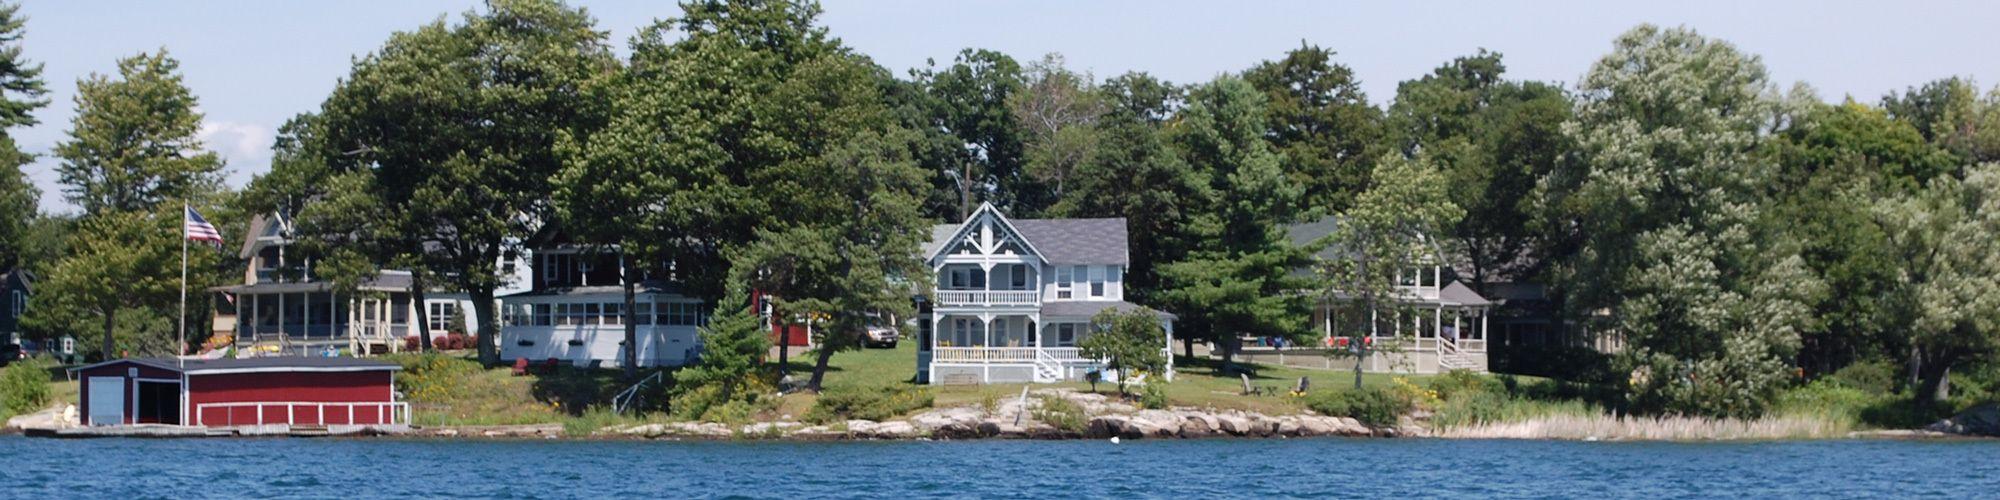 Island Park - EdMcNultyRealty com